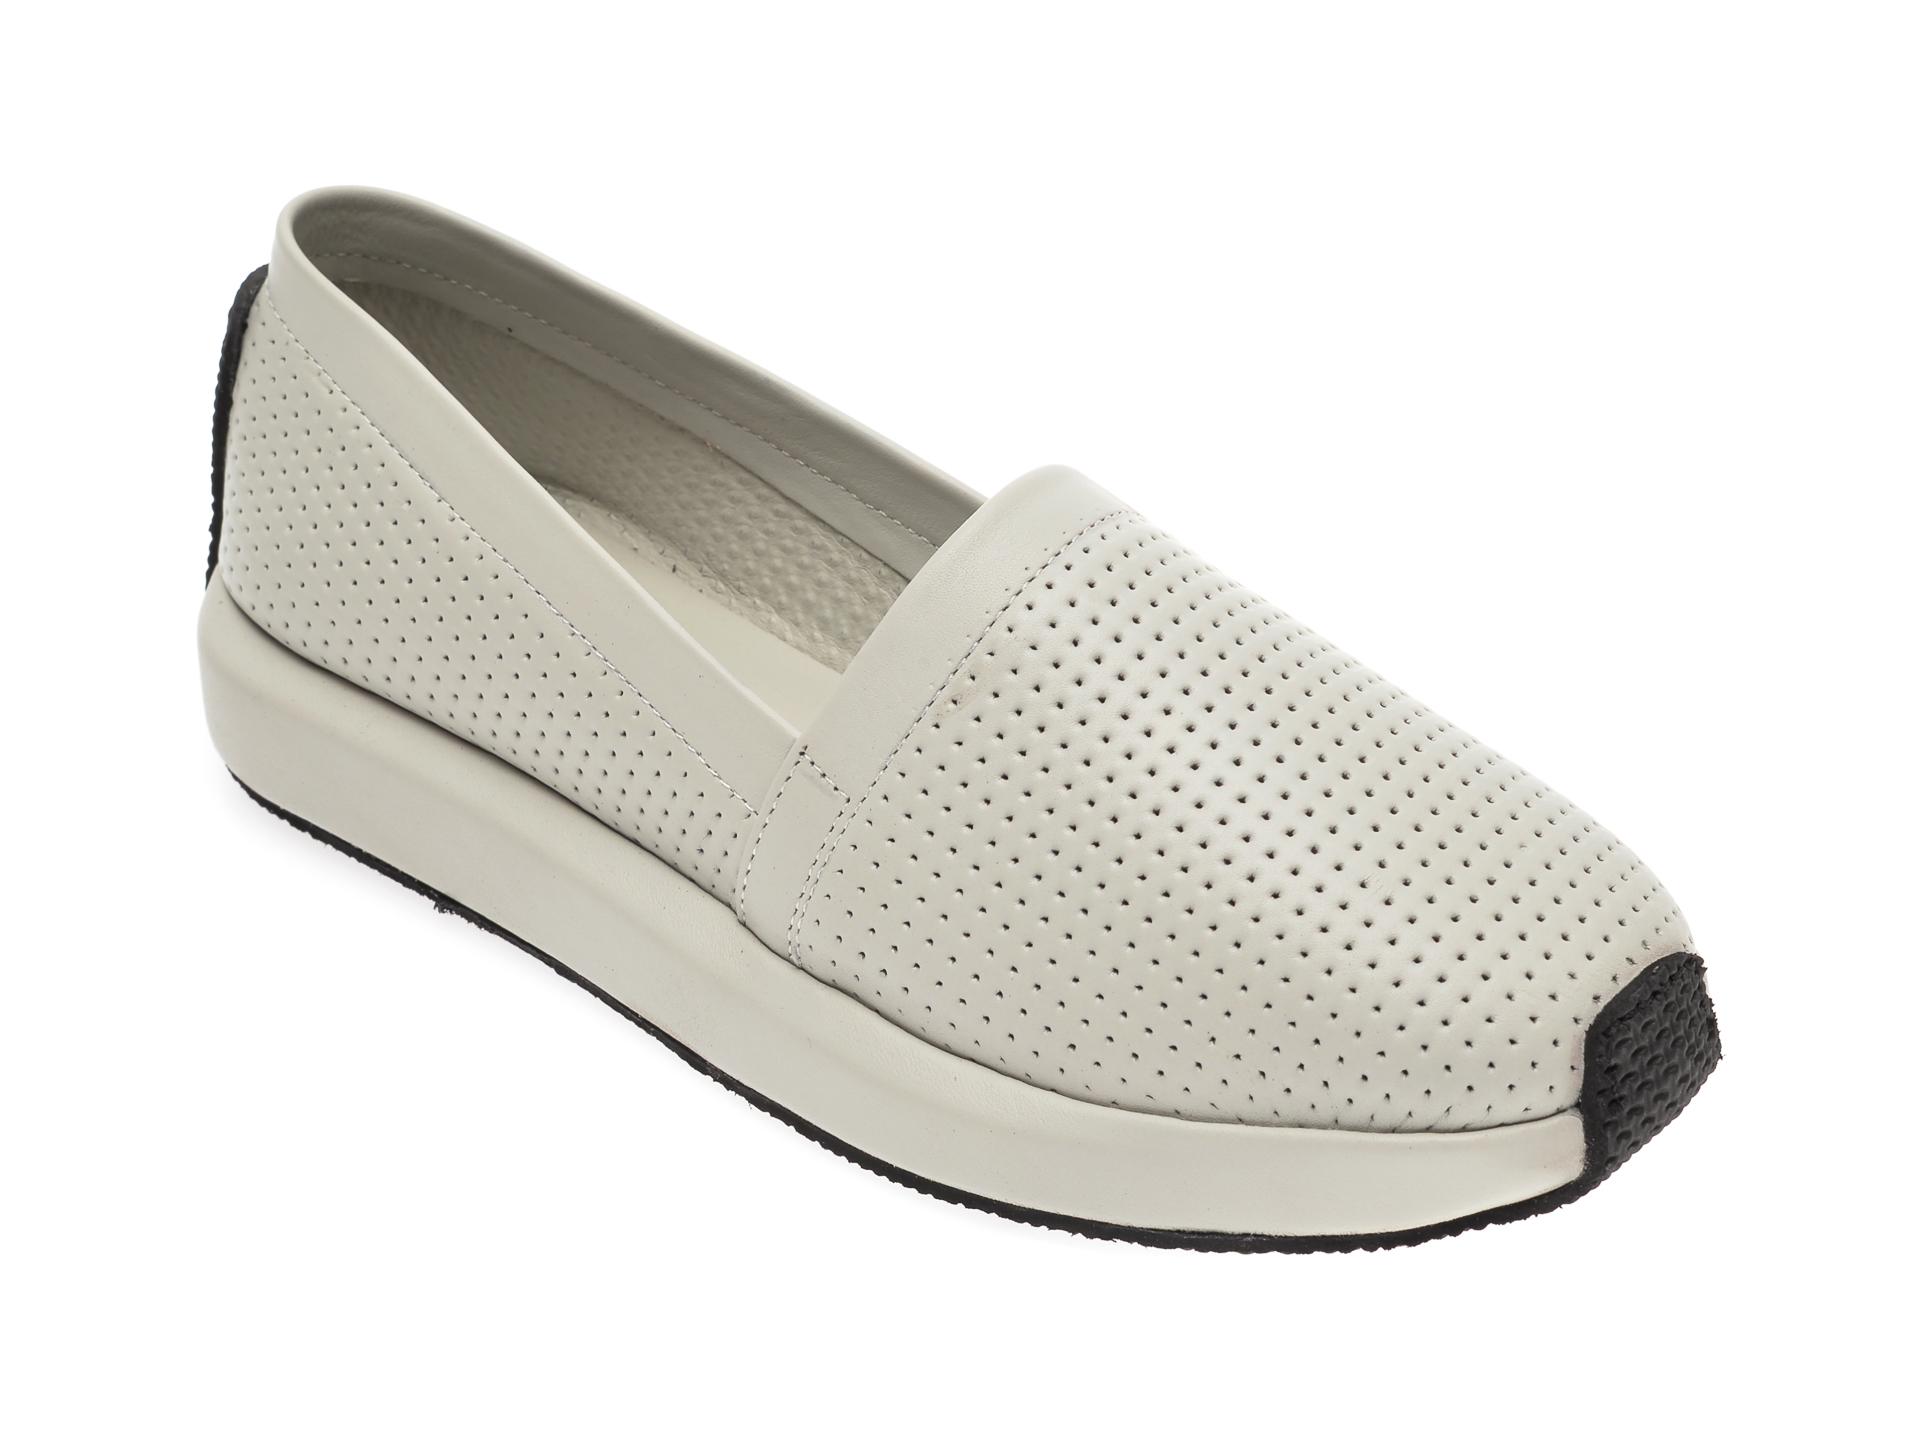 Pantofi FLAVIA PASSINI gri, 0856013, din piele naturala New